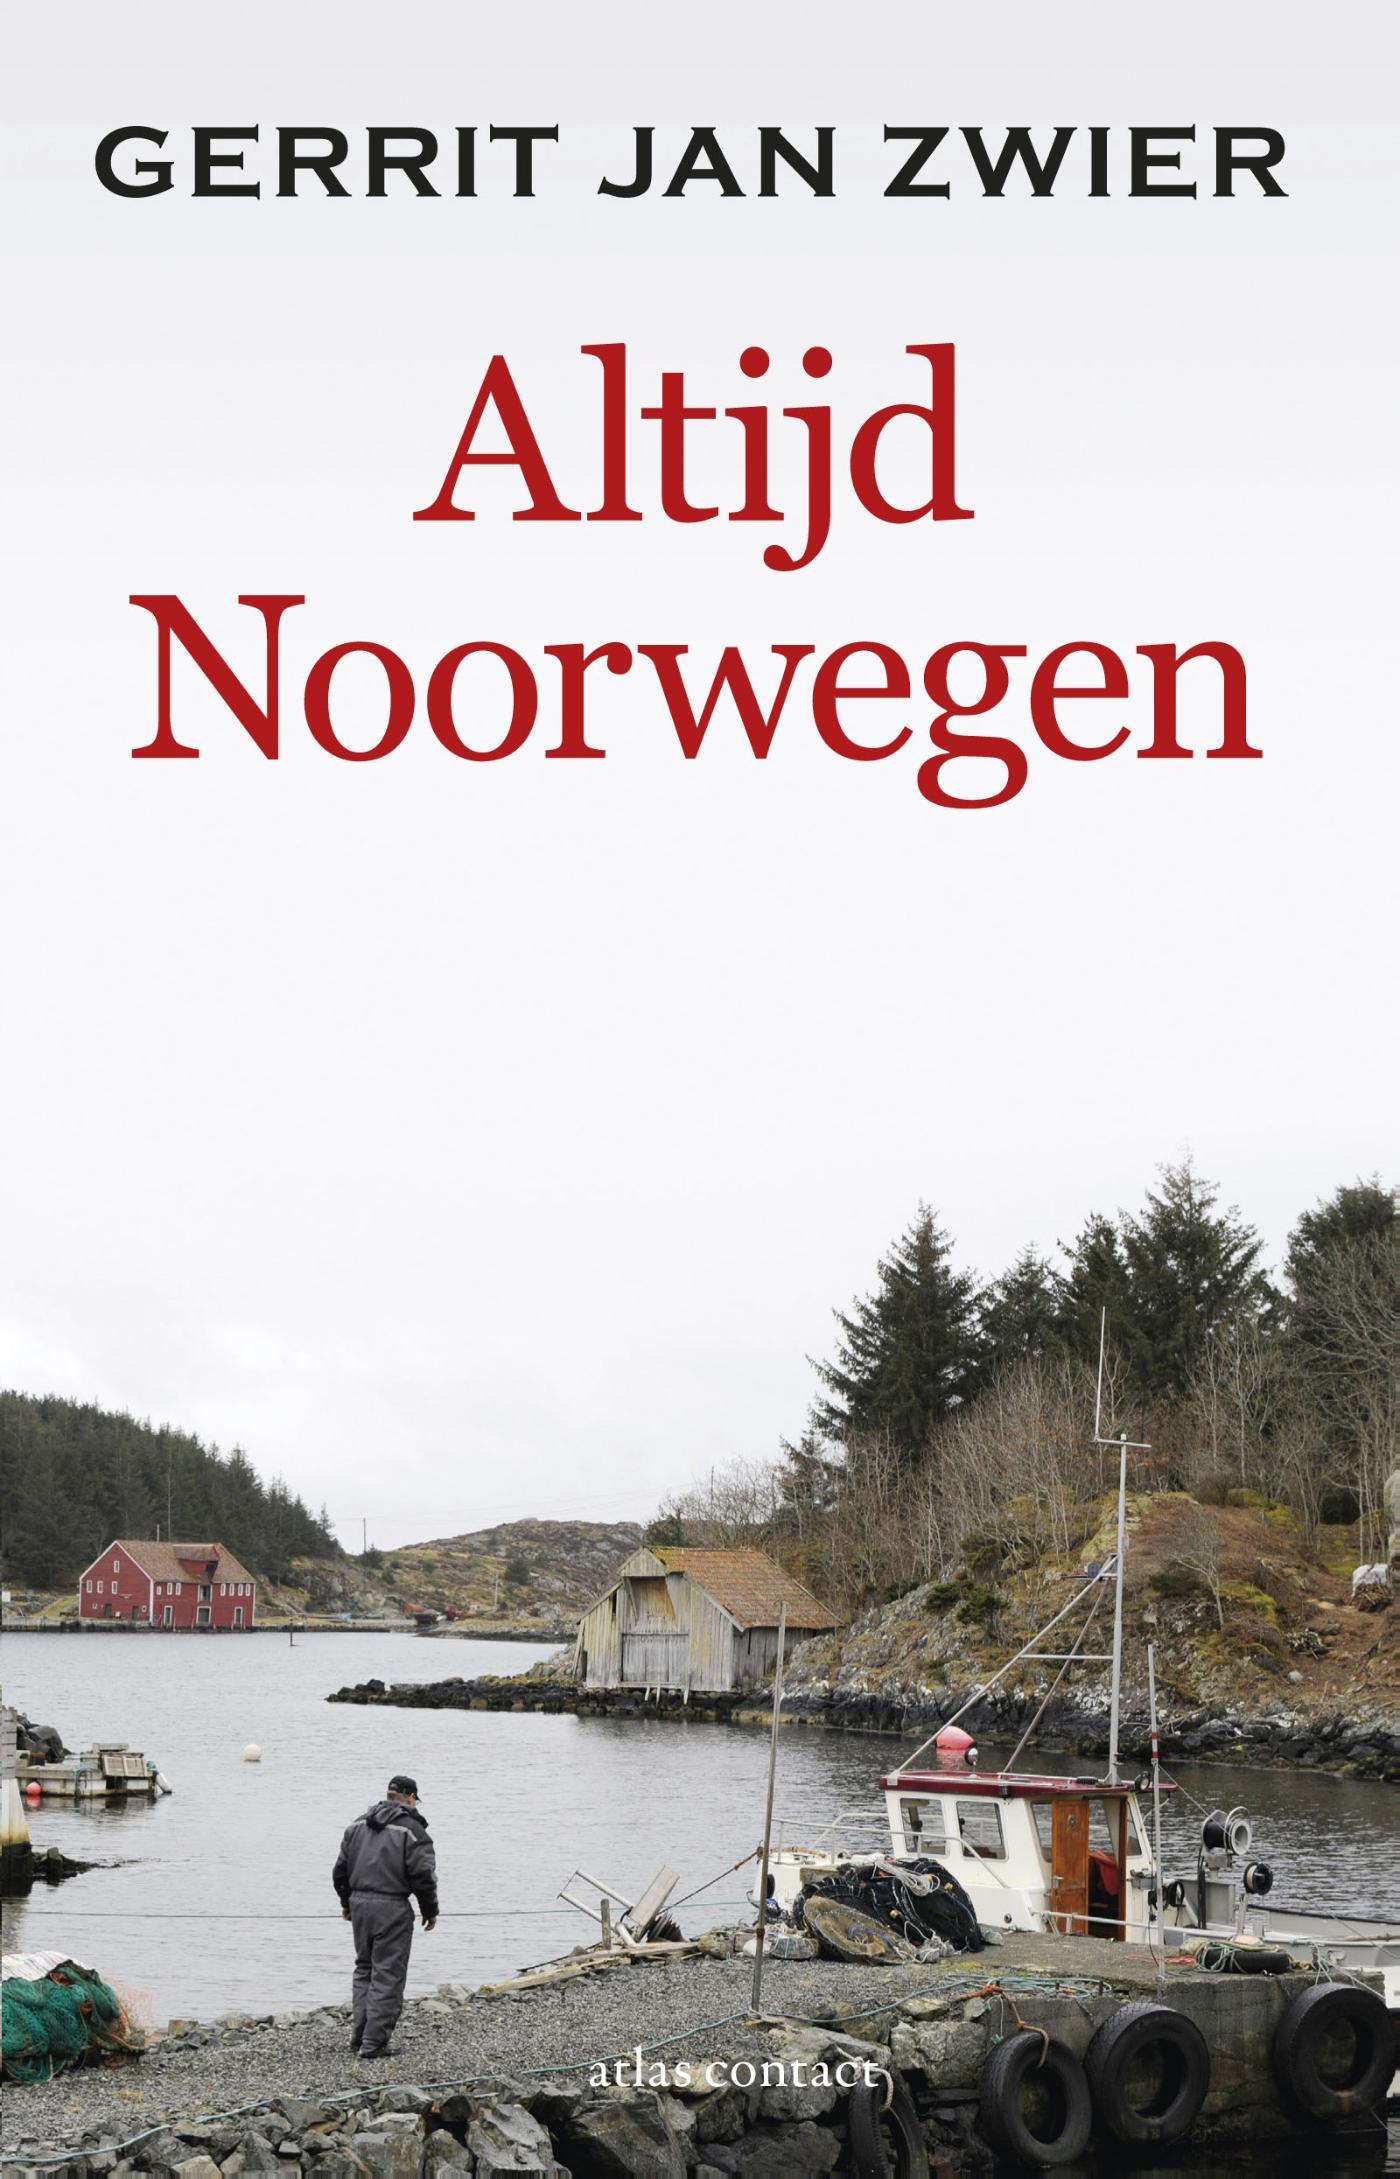 Reisverhaal Altijd Noorwegen - Gerrit Jan Zwier | G.J. Zwier <br/>€ 15.00 <br/> <a href='https://www.dezwerver.nl/reisgidsen/?tt=1554_252853_241358_&r=https%3A%2F%2Fwww.dezwerver.nl%2Fr%2Feuropa%2Fnoorwegen%2Fc%2Fboeken%2Freisverhalen%2F9789045031705%2Freisverhaal-altijd-noorwegen-gerrit-jan-zwier-gj-zwier%2F' target='_blank'>Meer Info</a>